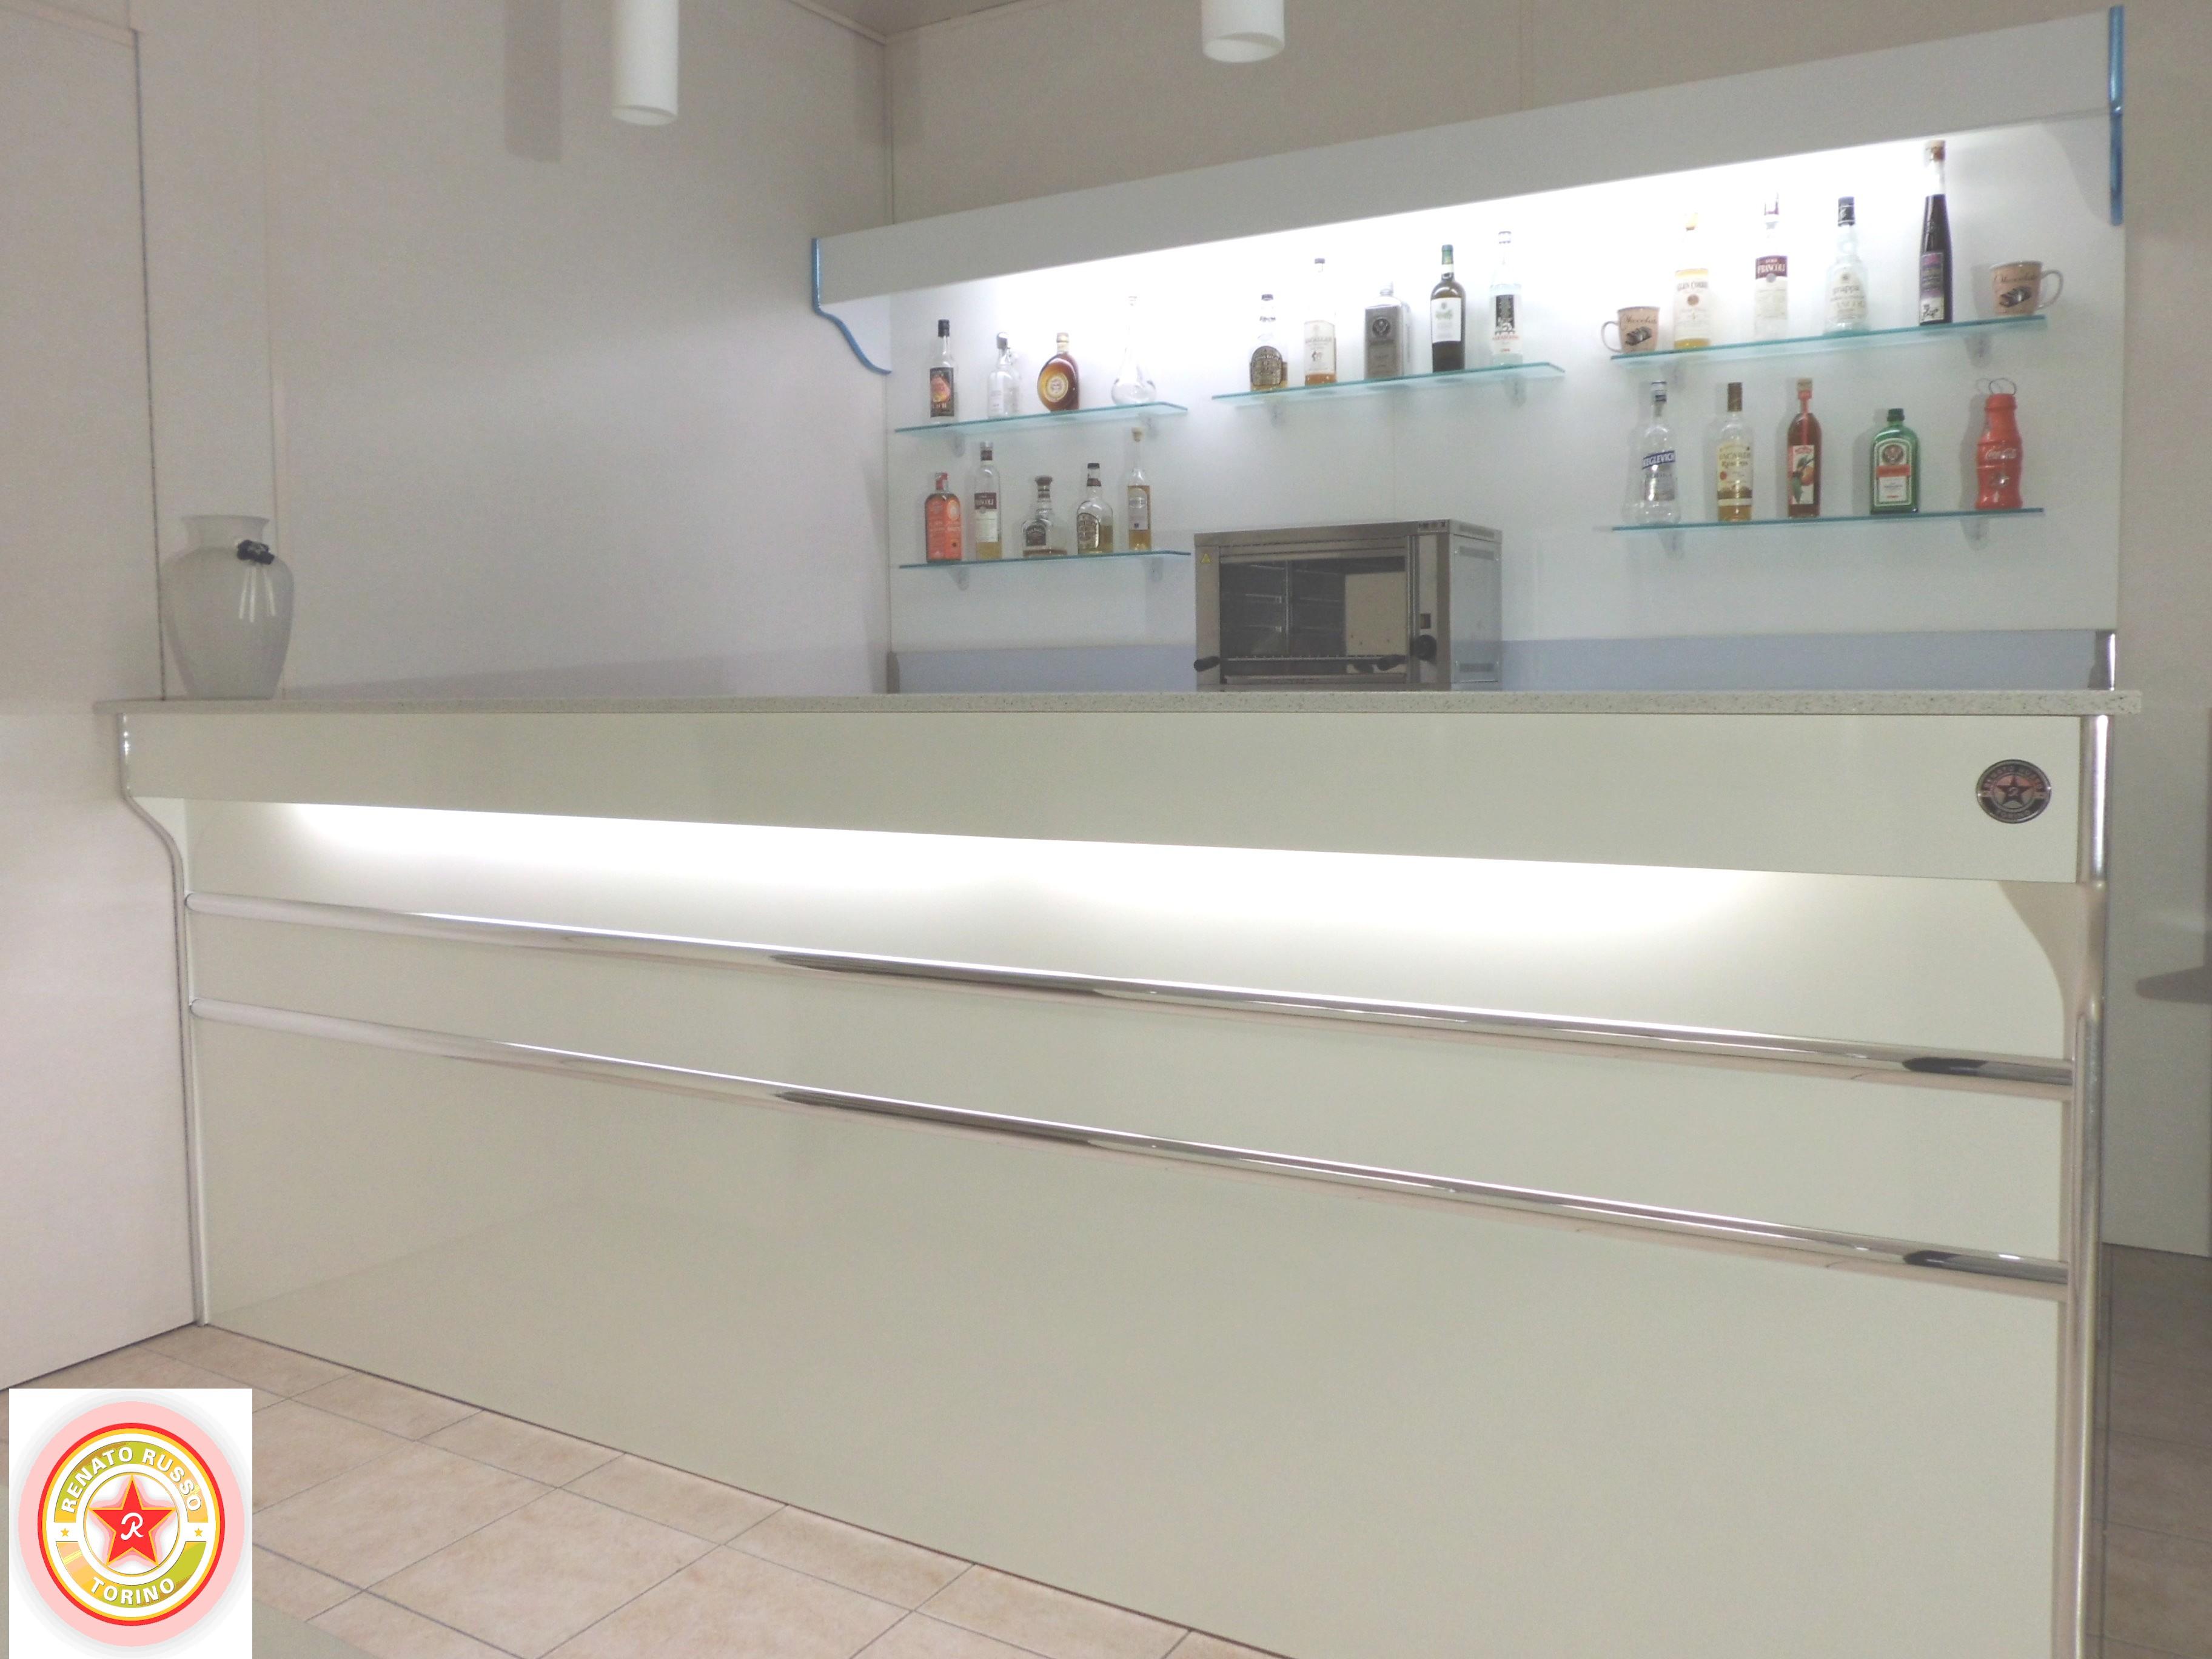 banchi bar prezzi banchi bar banconi bar banchi frigo